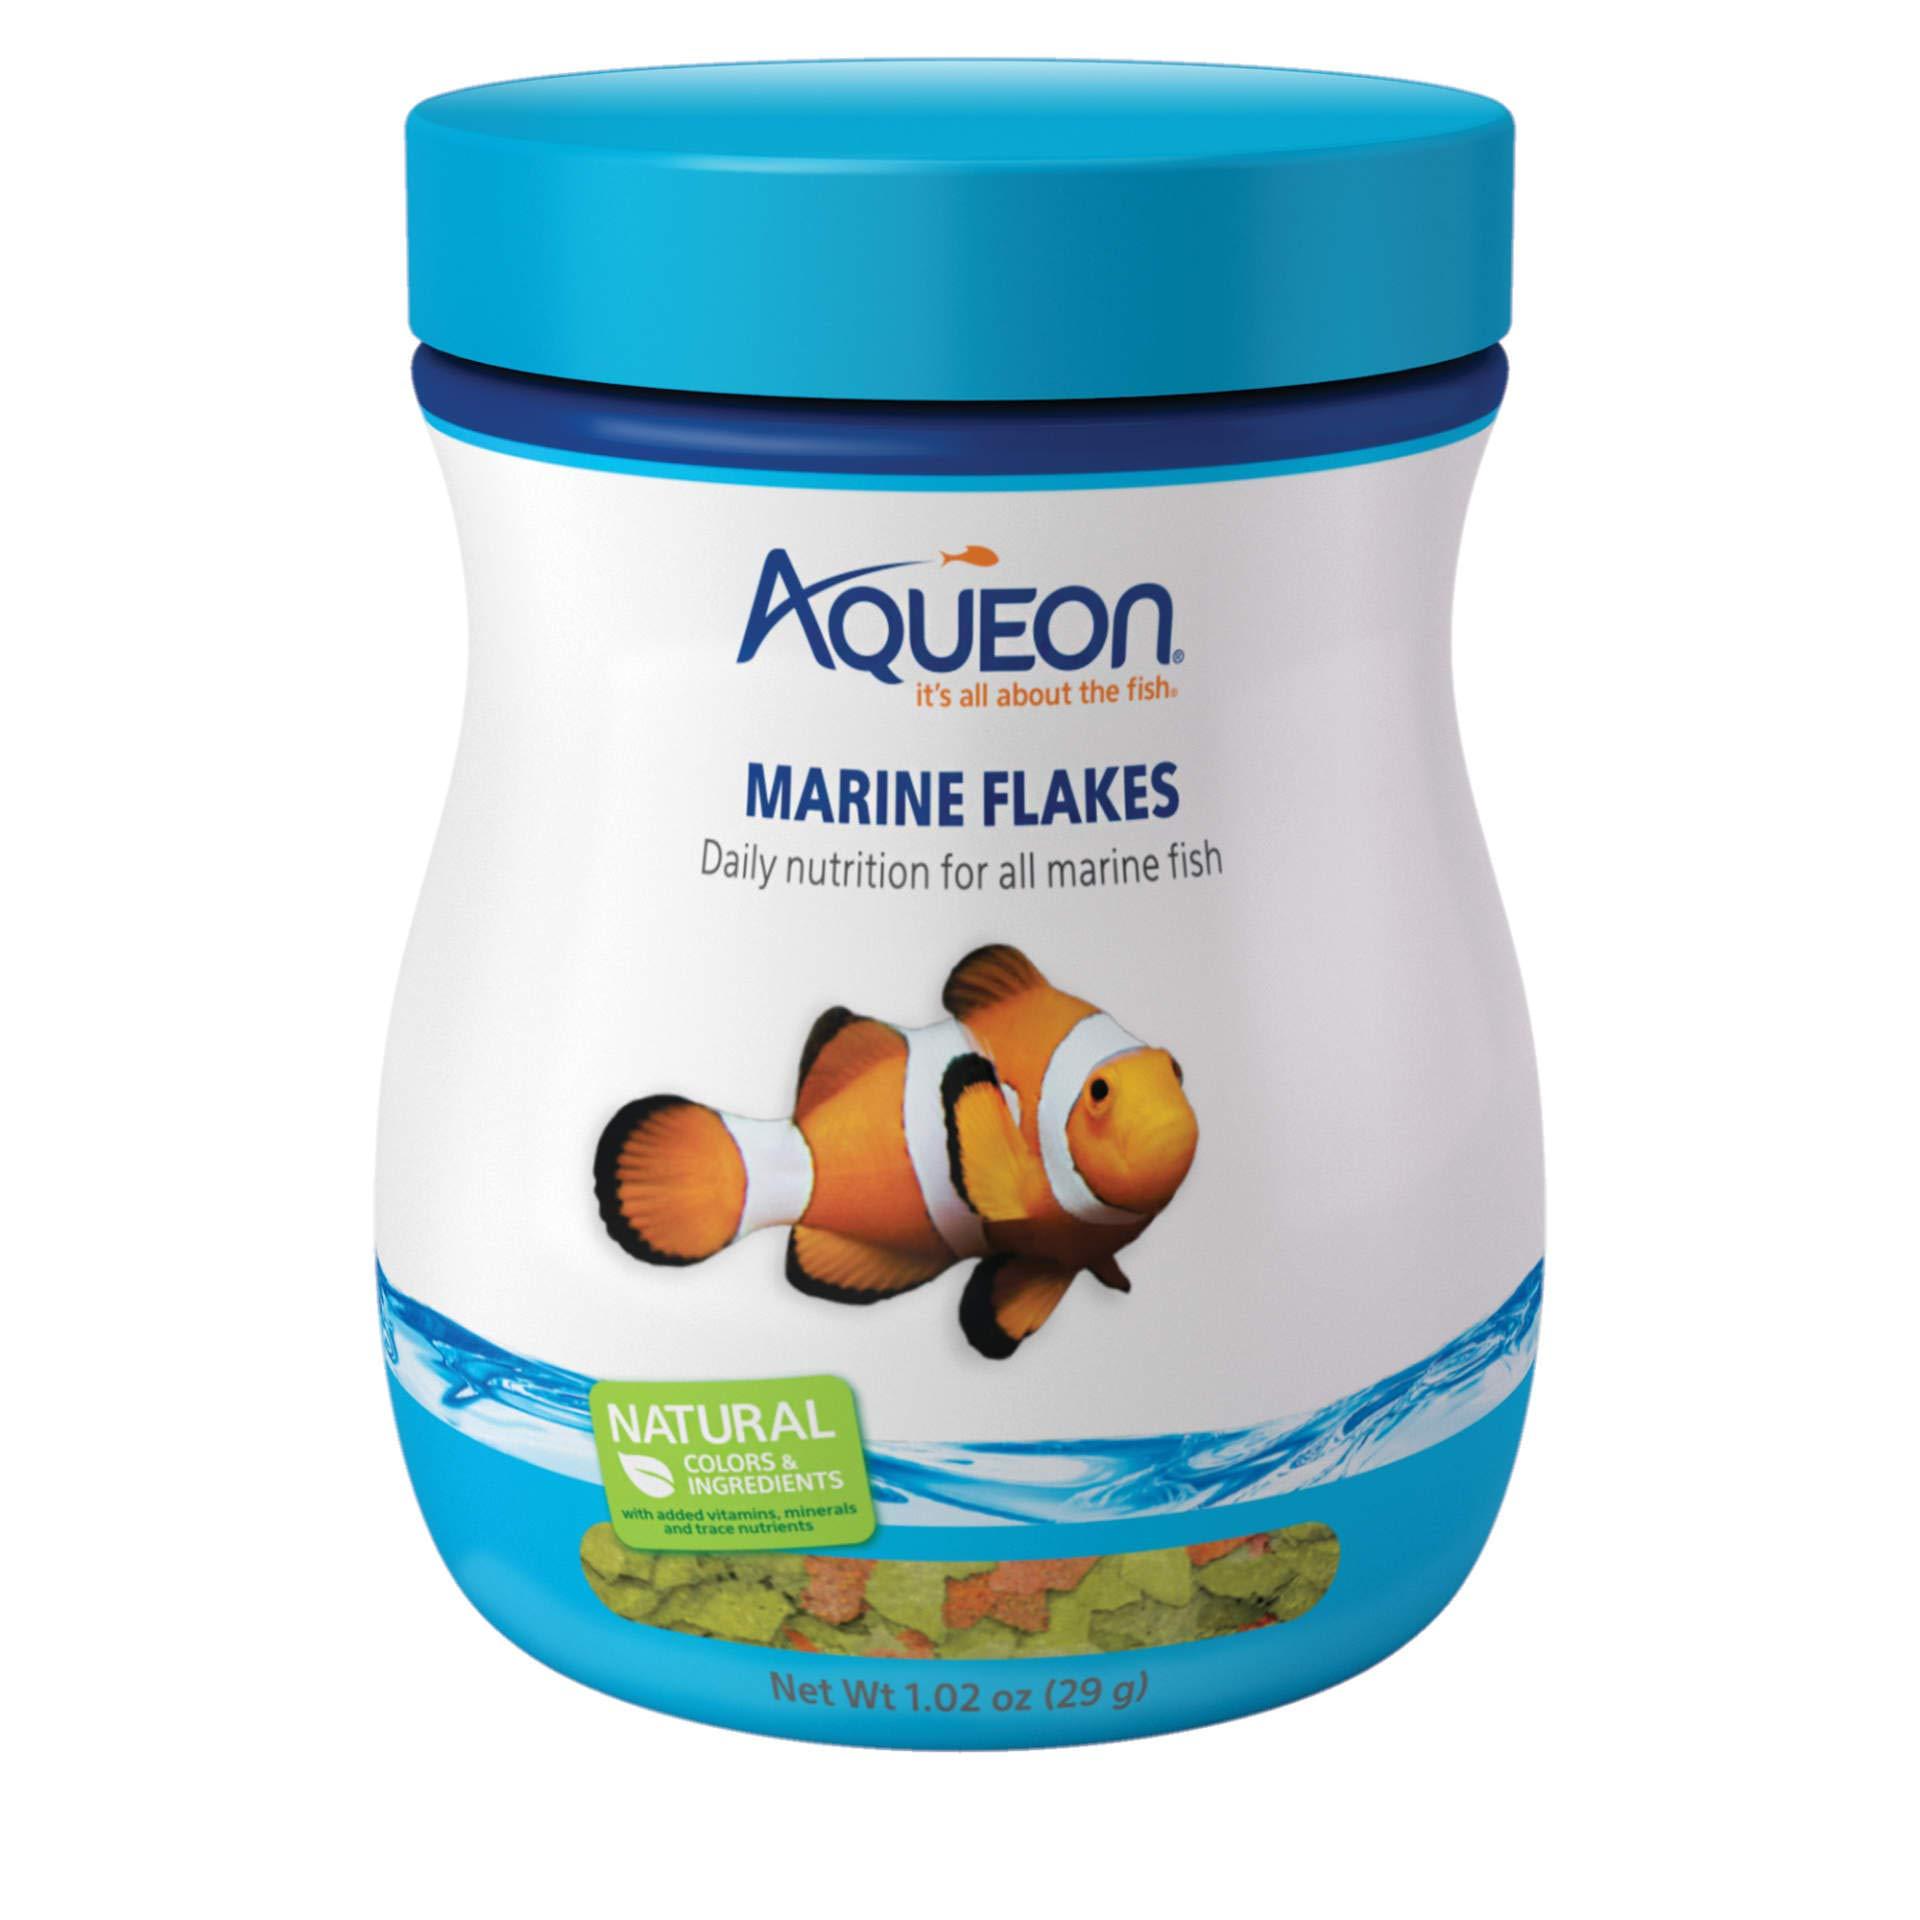 Aqueon 06045 Marine Flakes, 1.02-Ounce